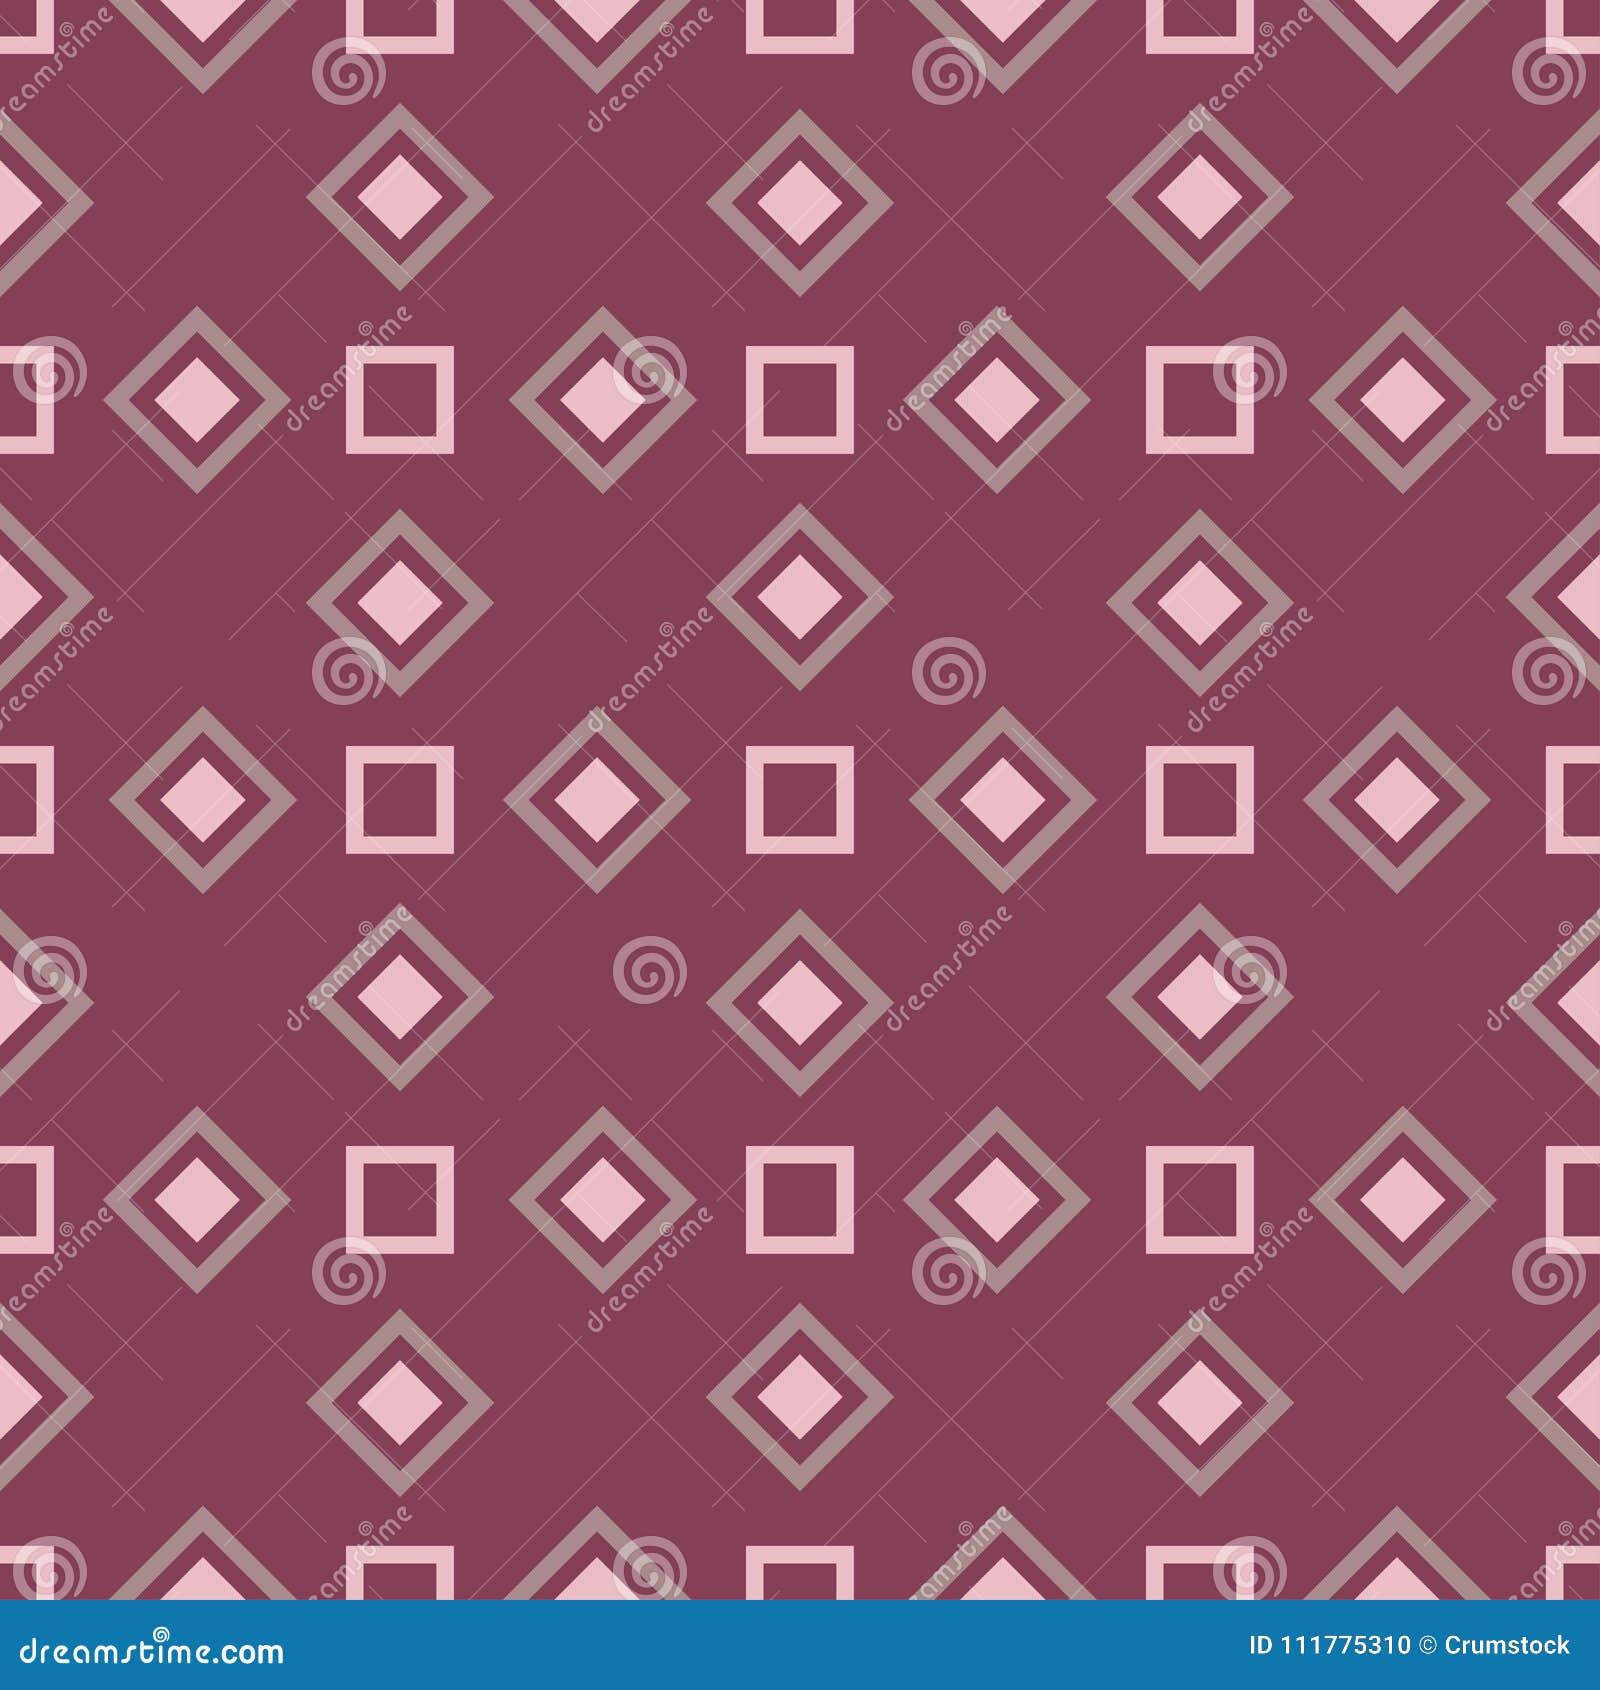 Geometric purple red seamless pattern